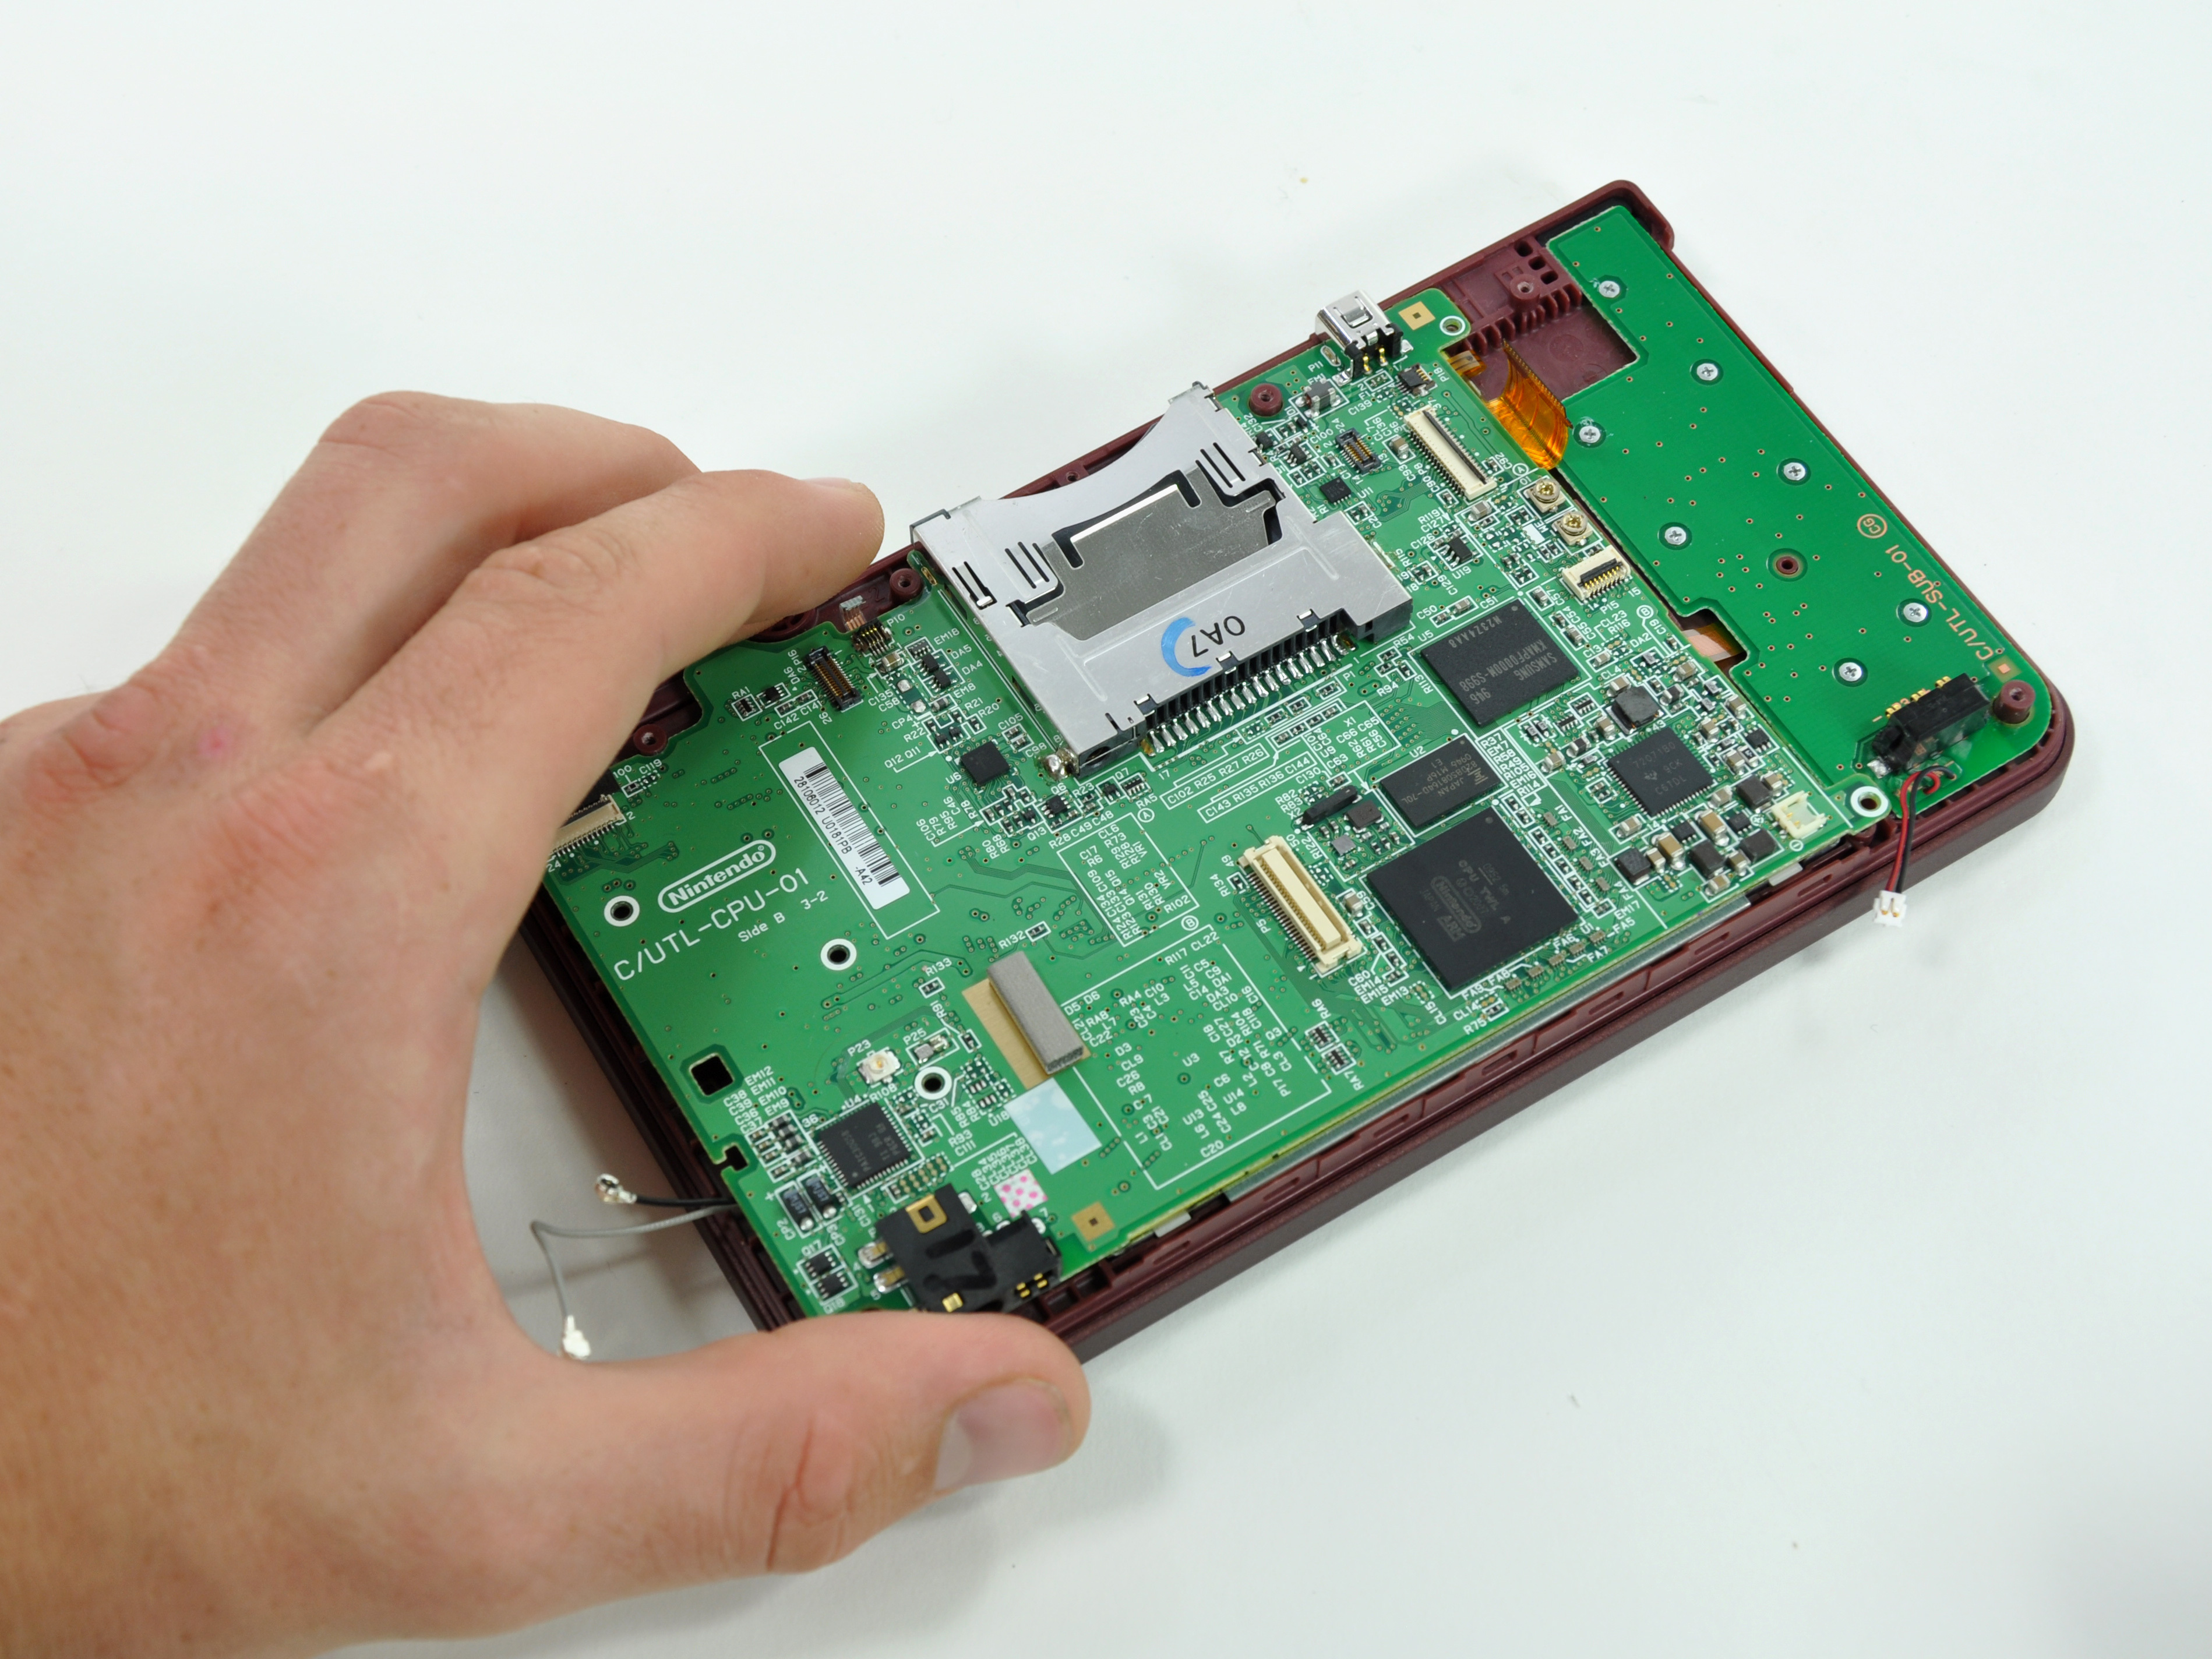 dsi xl repair ifixitnintendo dsi xl motherboard replacement